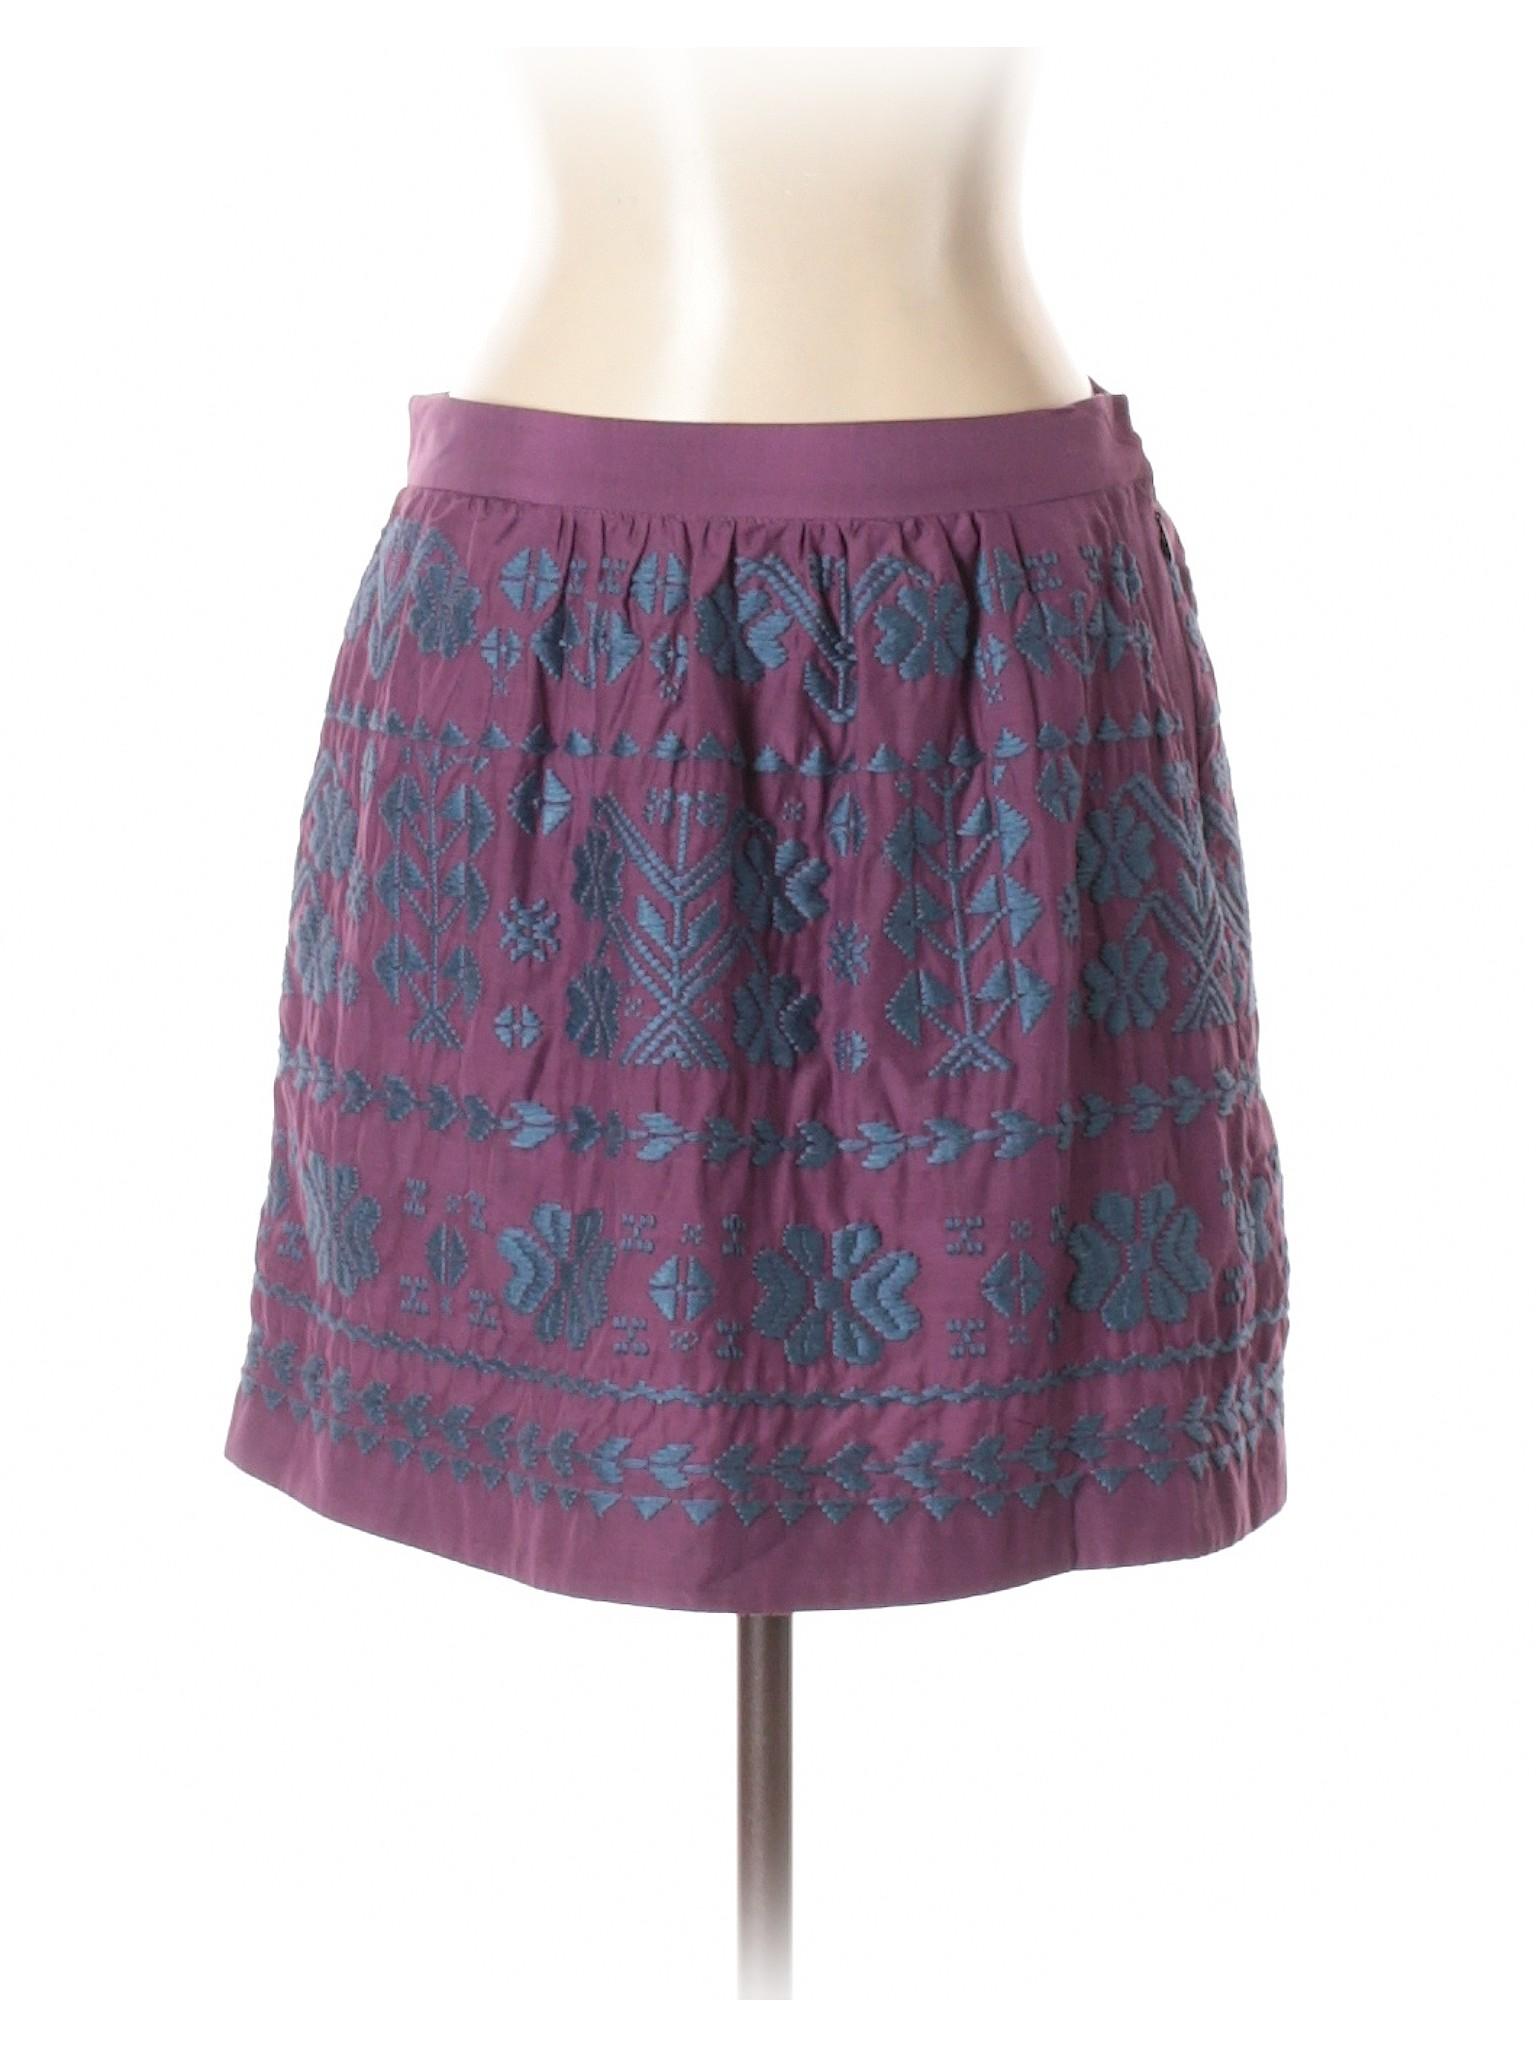 Boutique Casual Boutique Boutique Casual Boutique Skirt Skirt Skirt Skirt Casual Casual qTwOBOHS